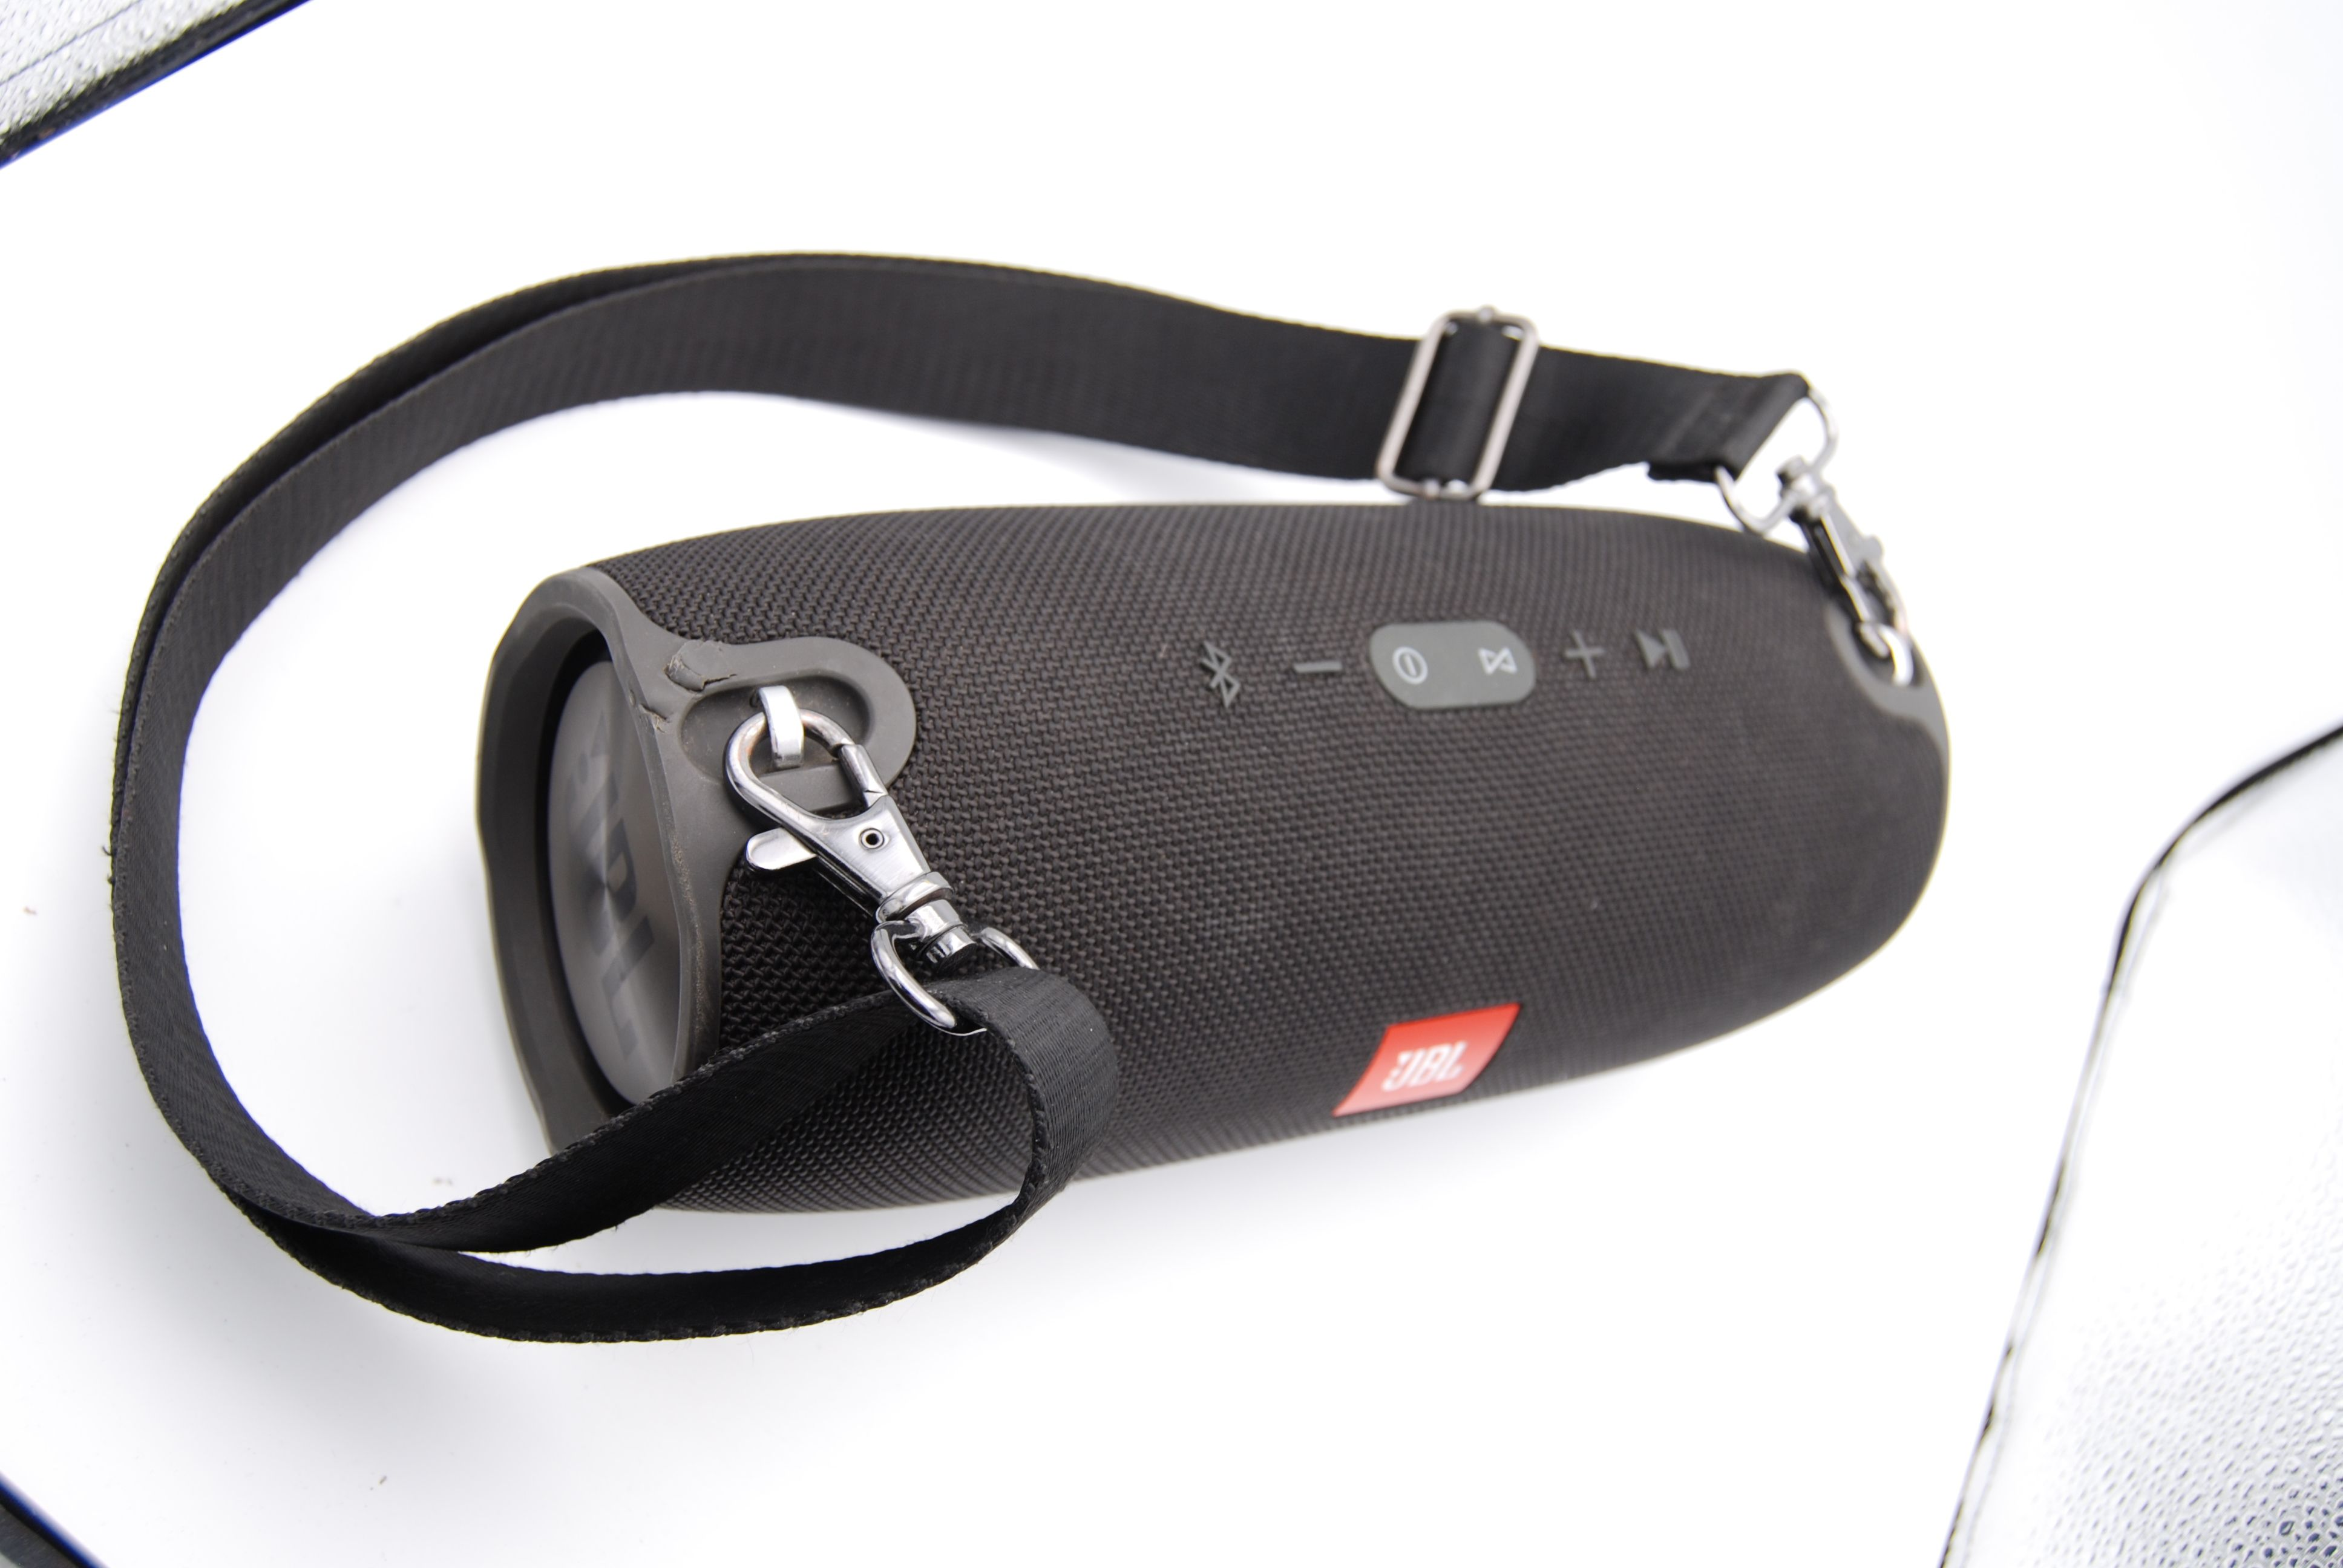 Jbl Xtreme Portable Splashproof Wireless Bluetooth Speaker Black Ebay